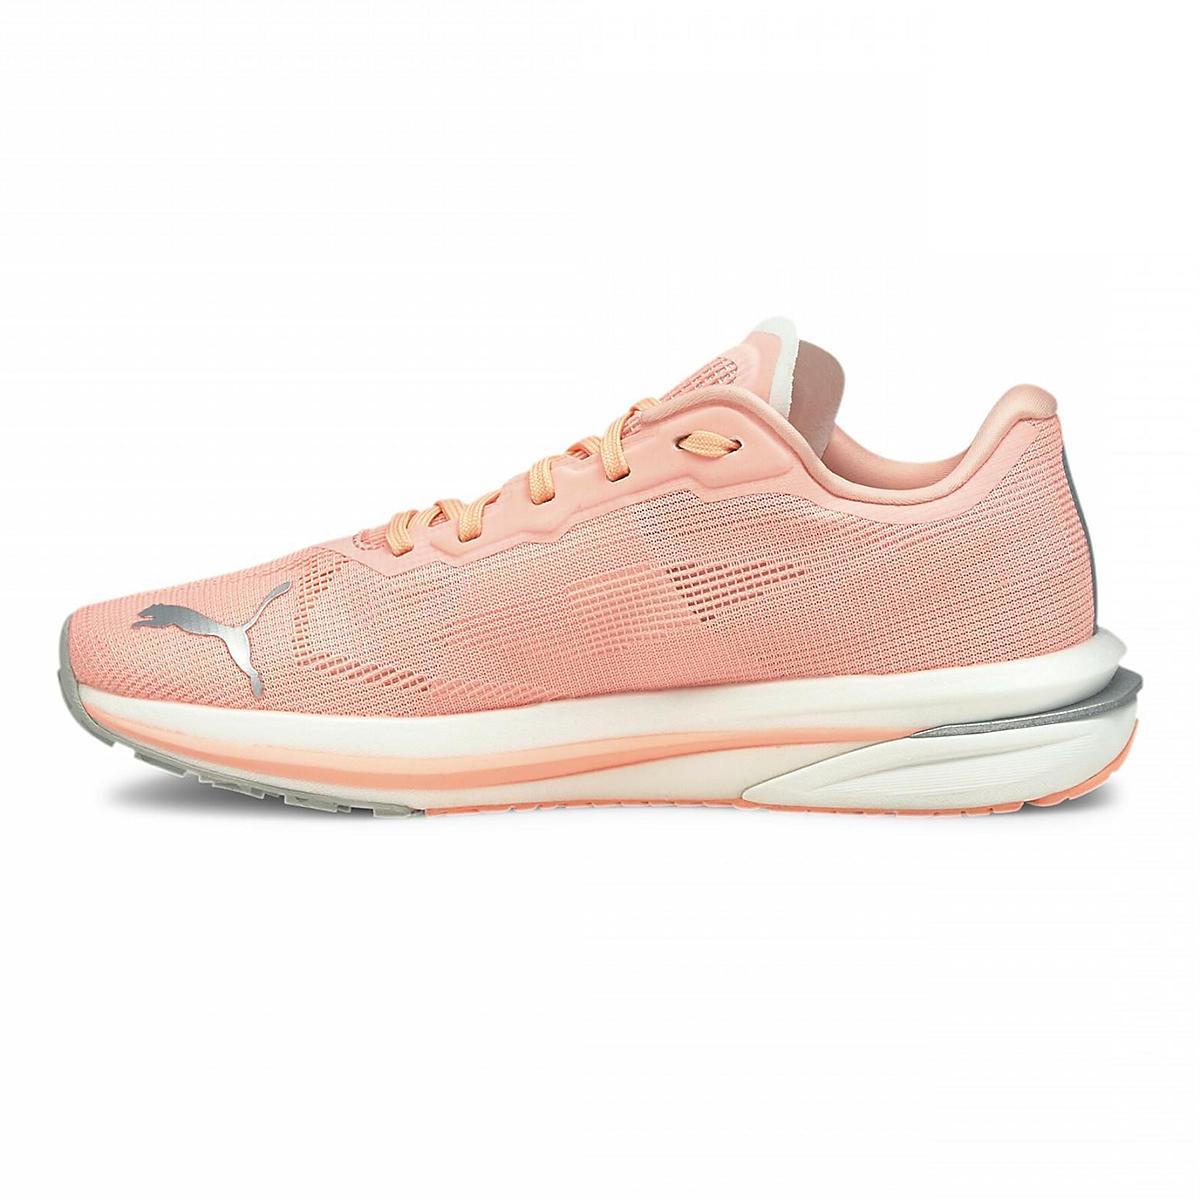 Women's Puma Velocity Nitro Running Shoe - Color: Elektro Peach-Puma Silver - Size: 5.5 - Width: Regular, Elektro Peach-Puma Silver, large, image 2